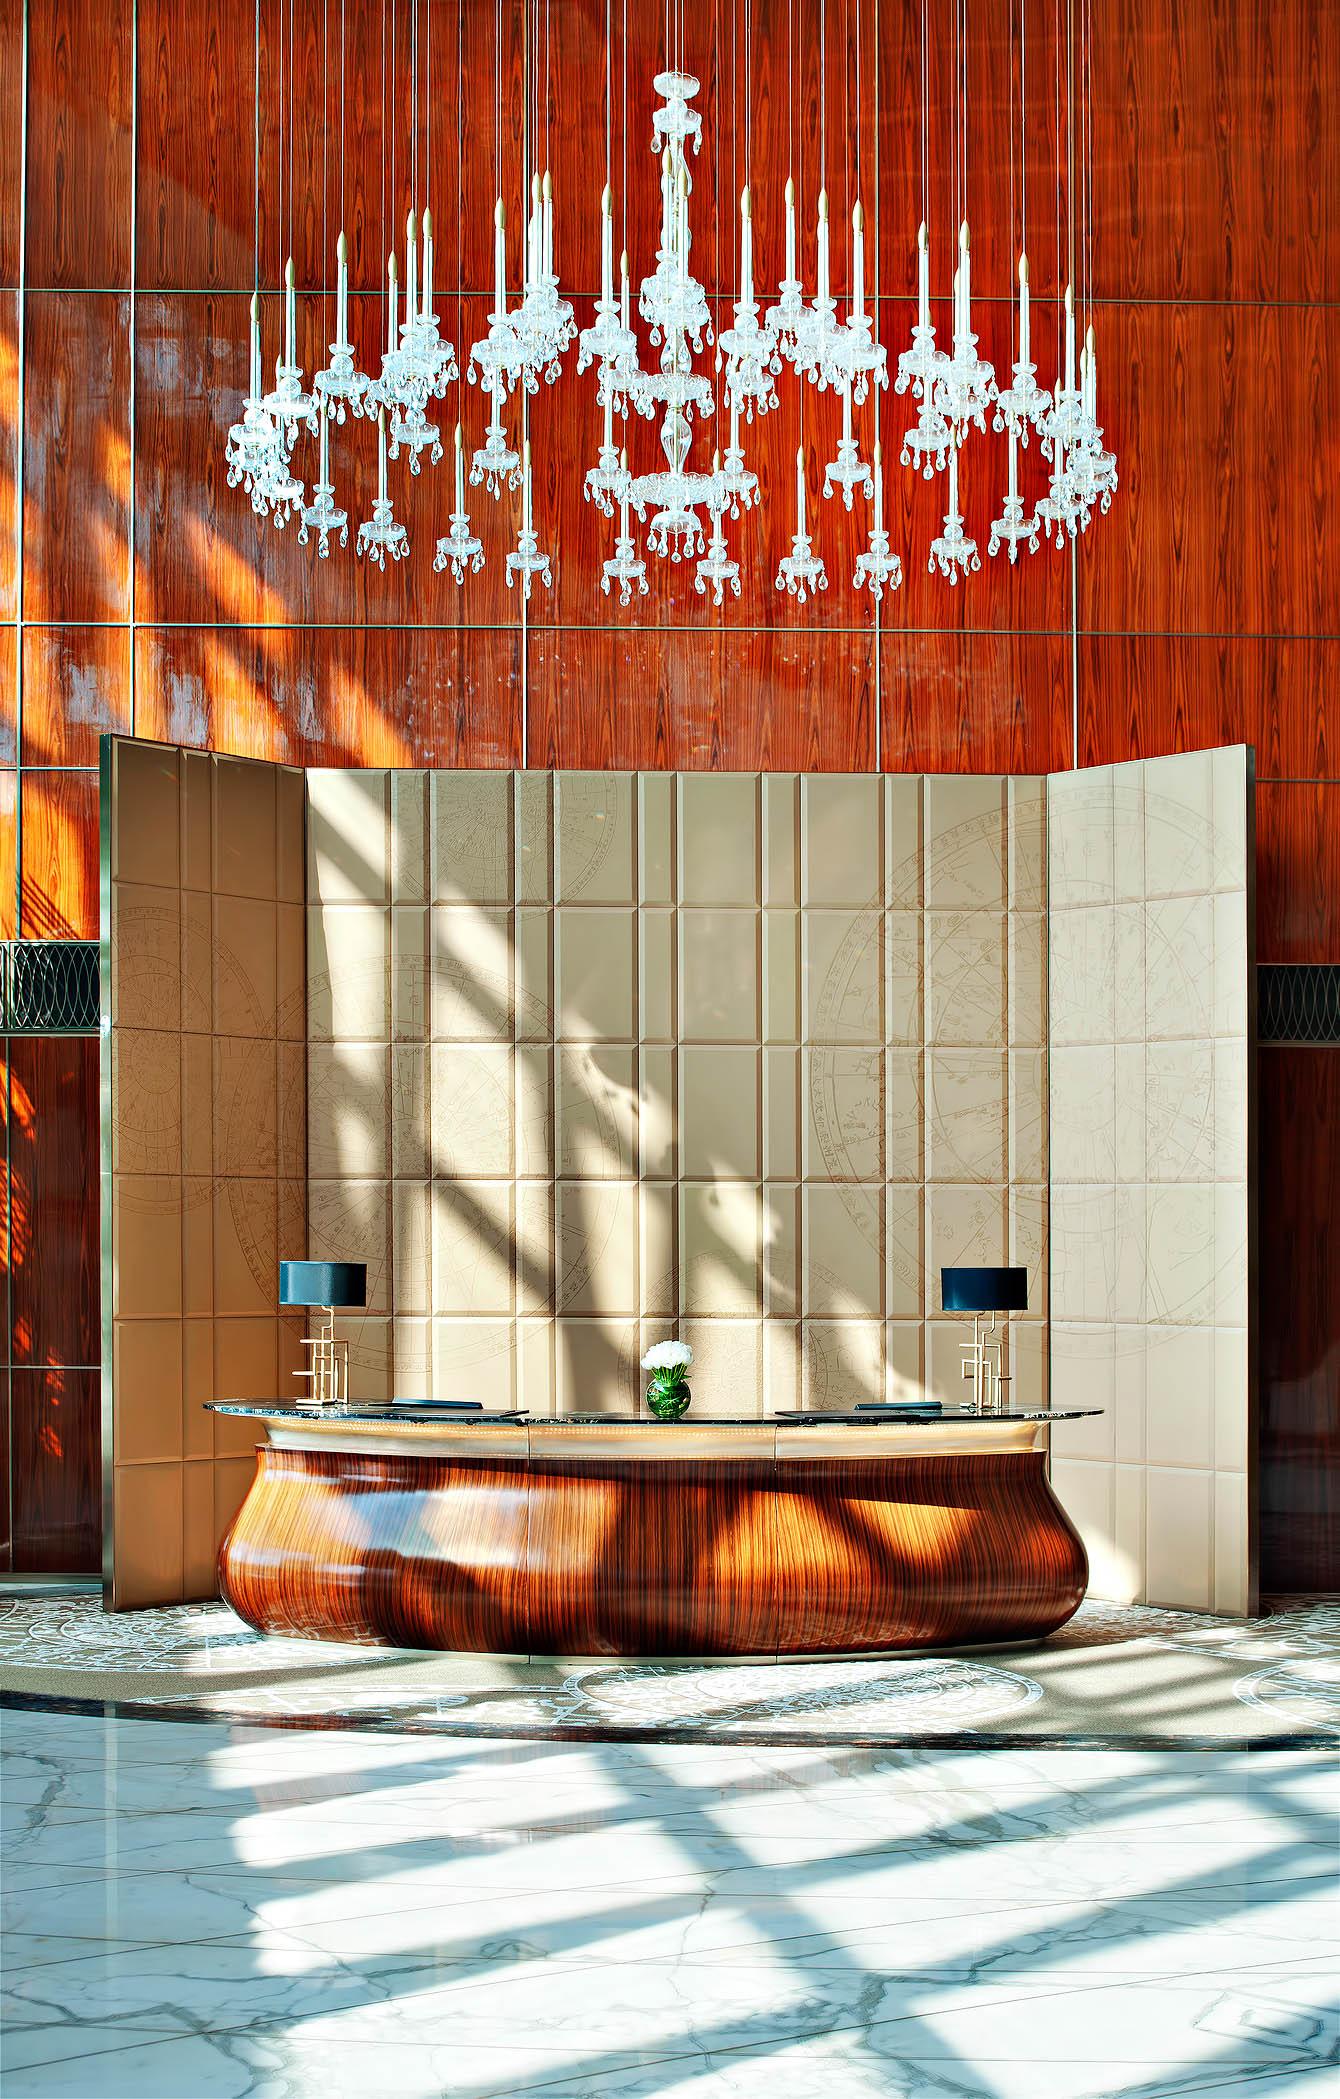 The St. Regis Tianjin Luxury Hotel - Tianjin, China - Lobby Desk